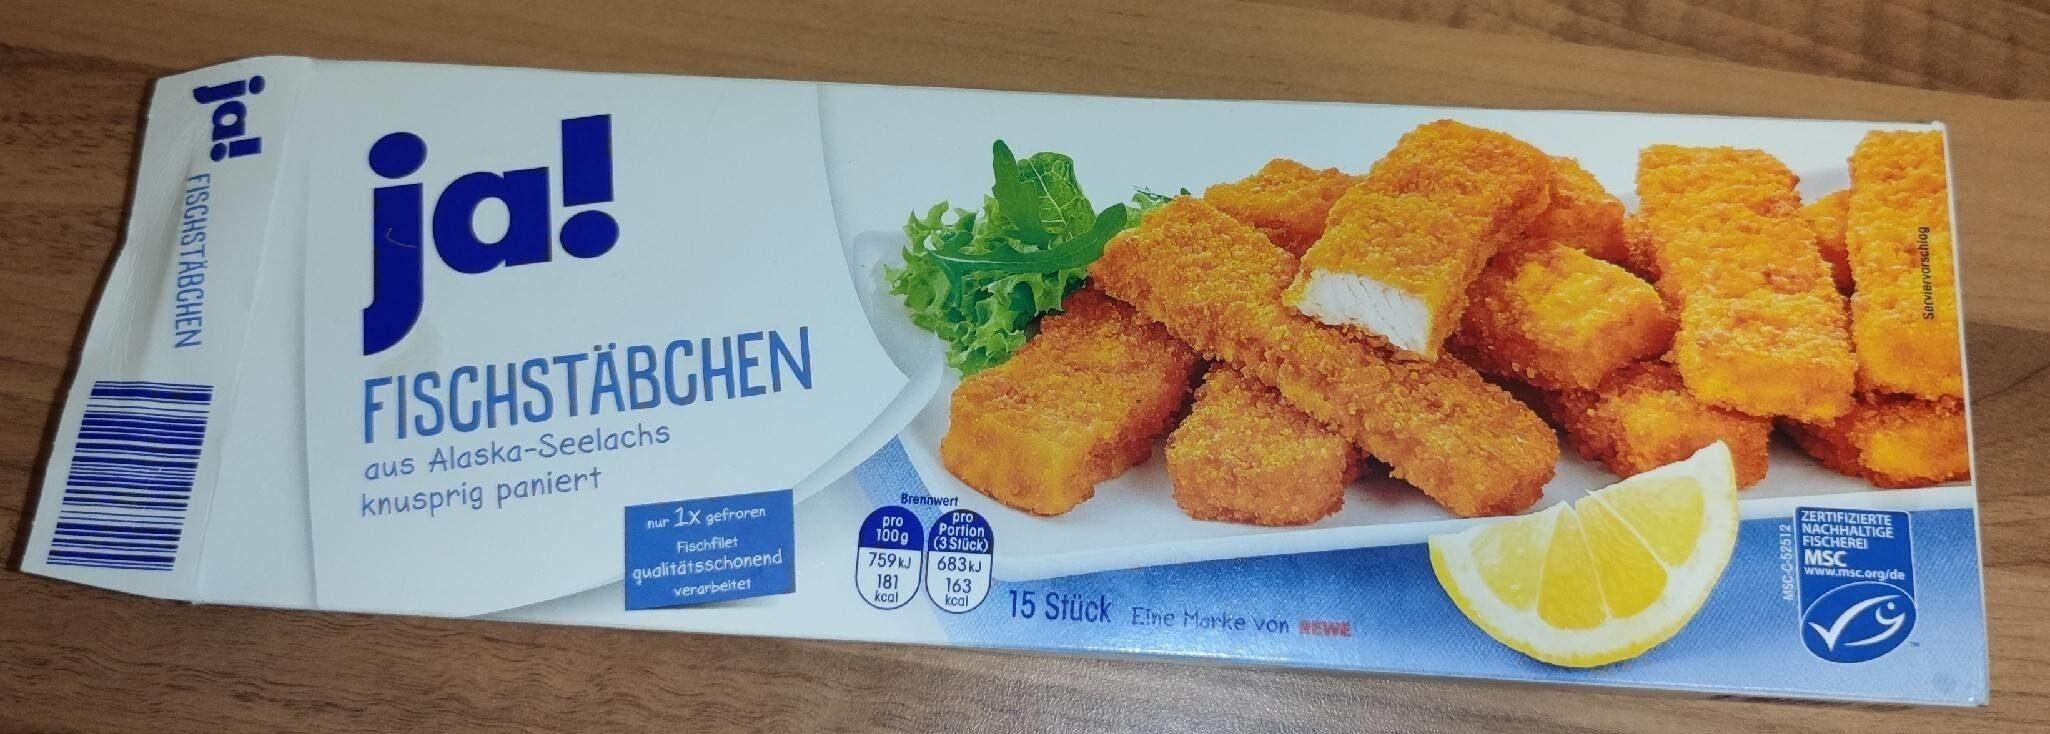 Fischstäbchen - Produkt - en